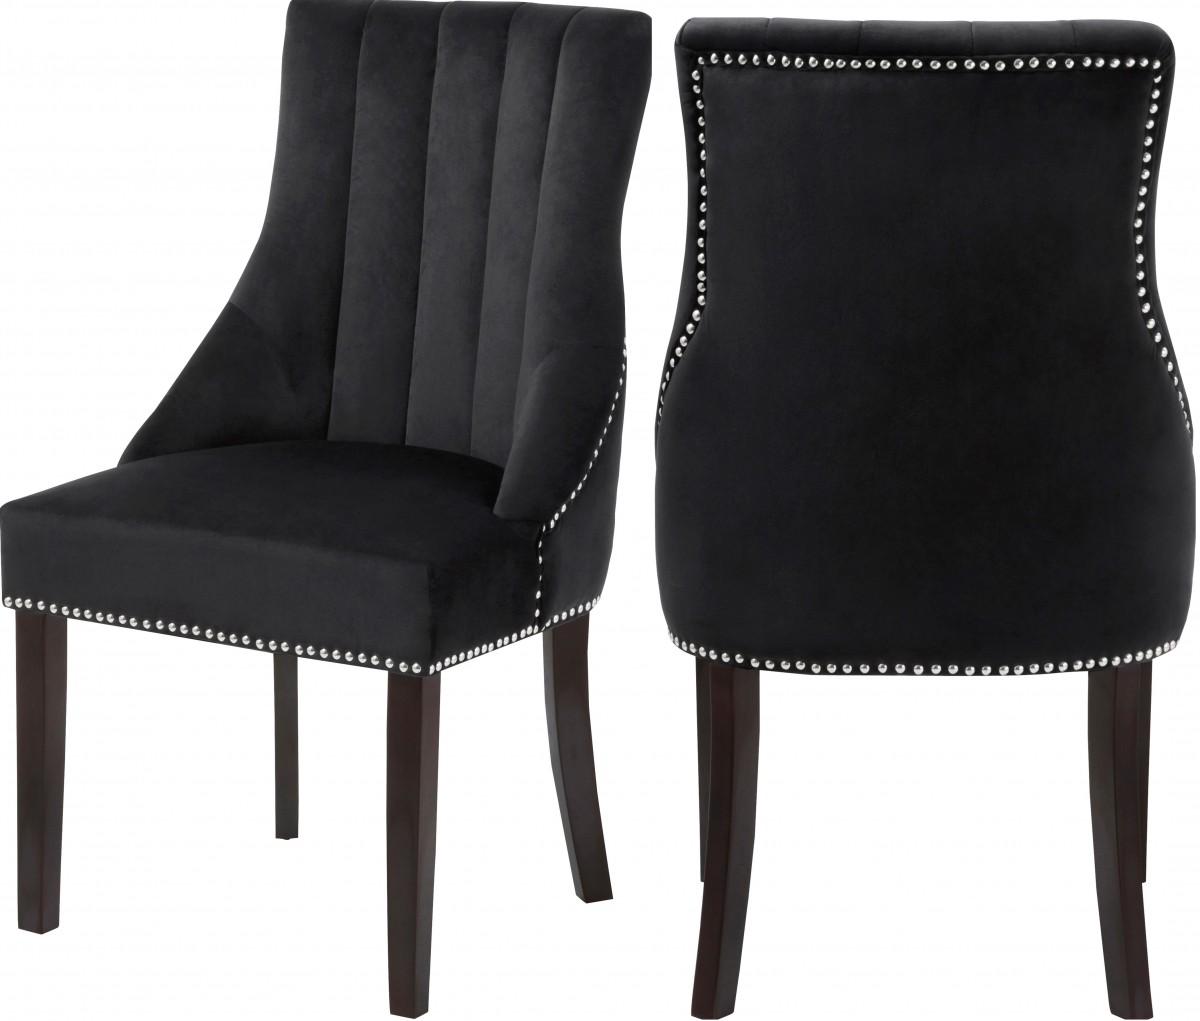 Cheap Black Dining Chairs: Meridian Oxford Black Velvet Dining Chair